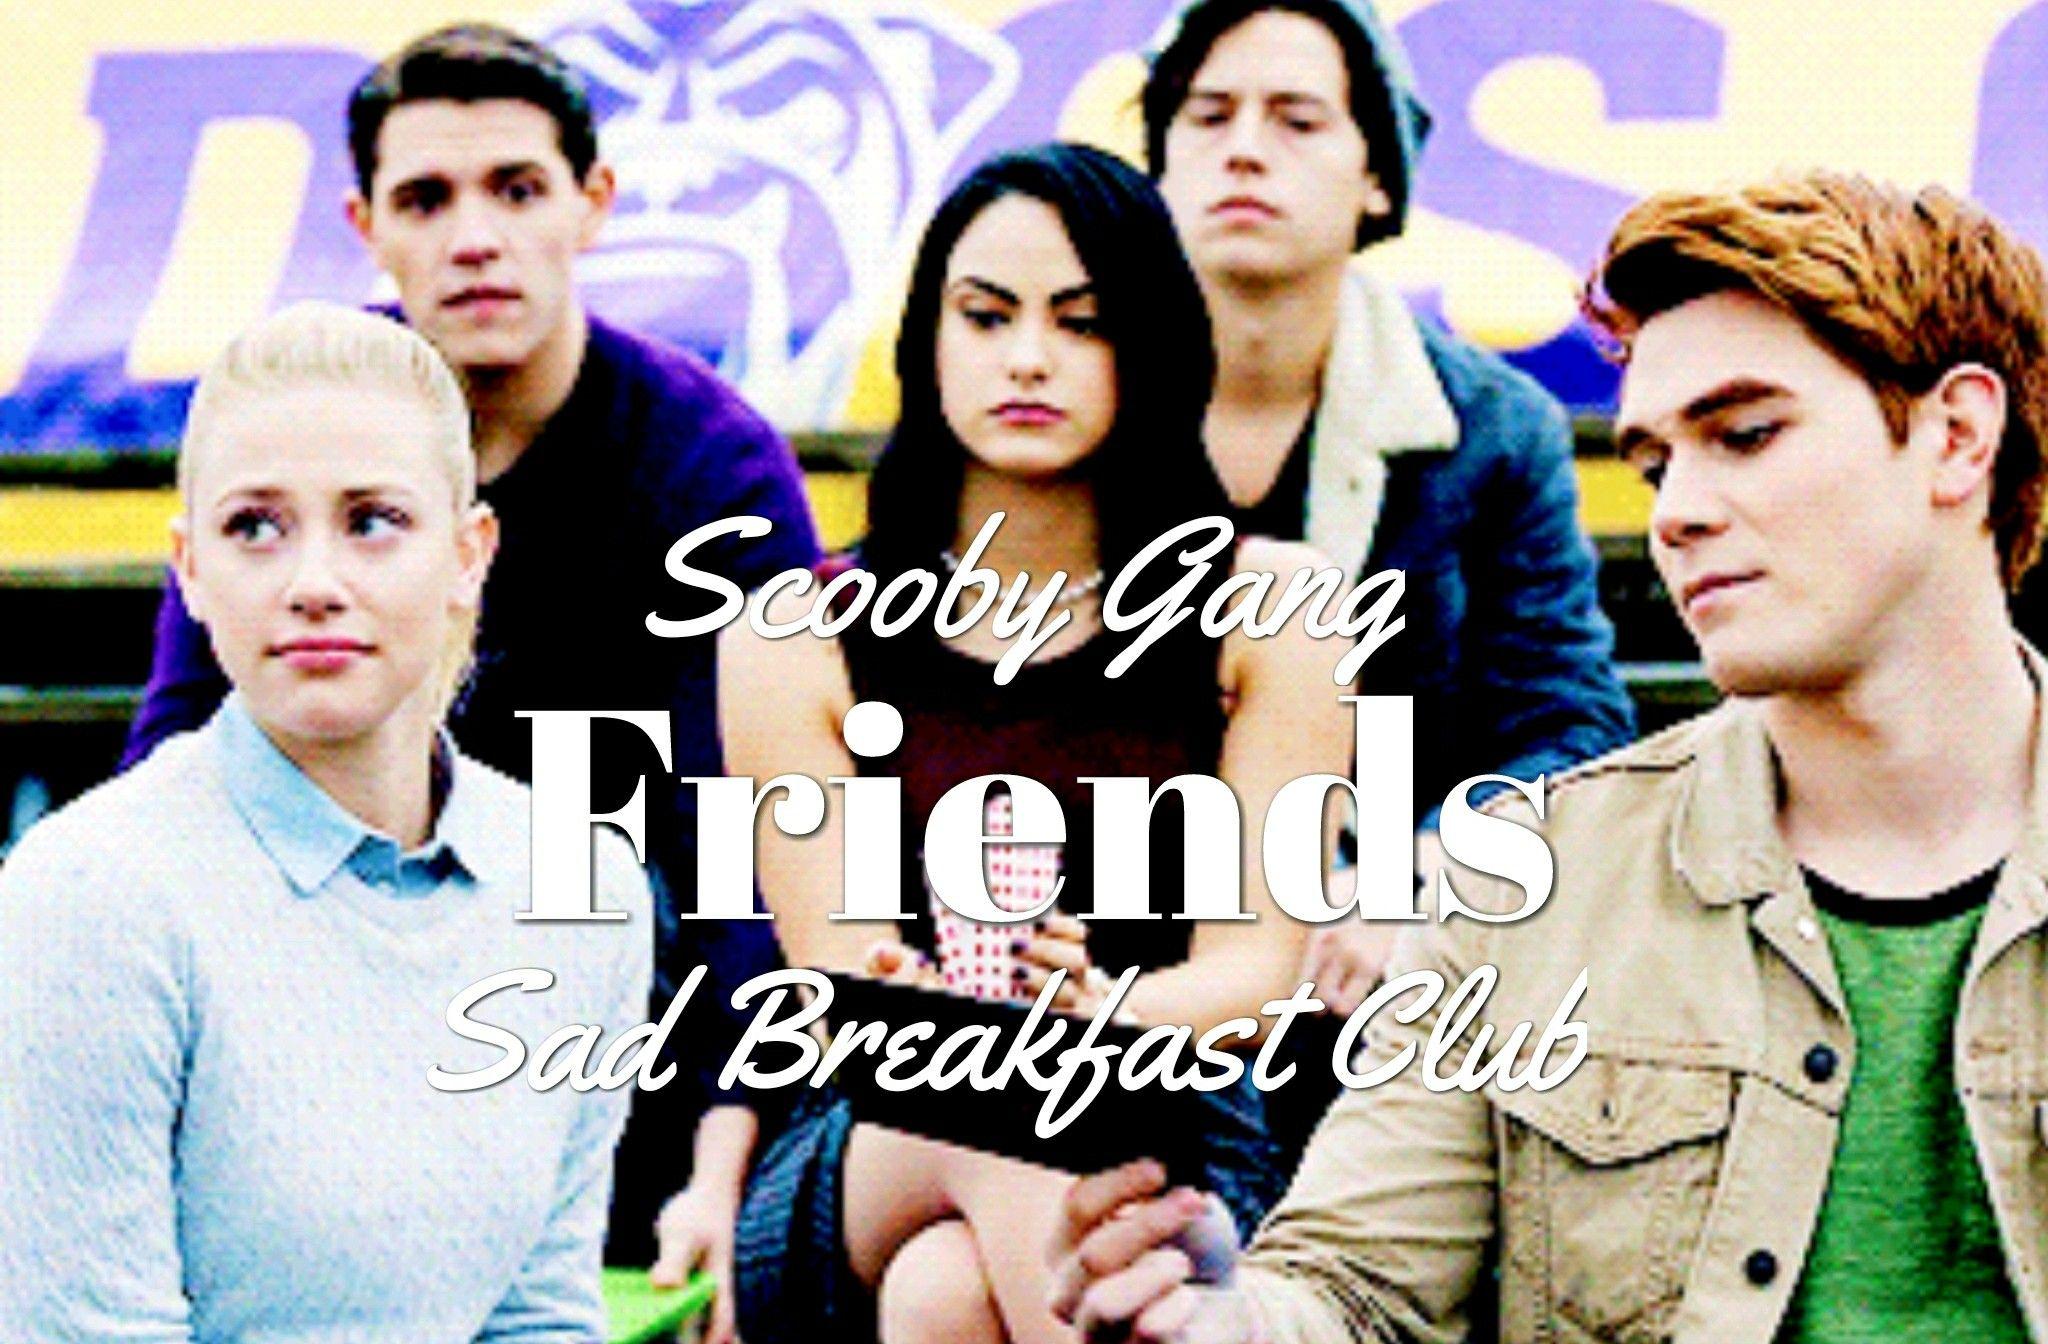 Riverdale friends sad breakfast club scooby gang cheer me up riverdale memes